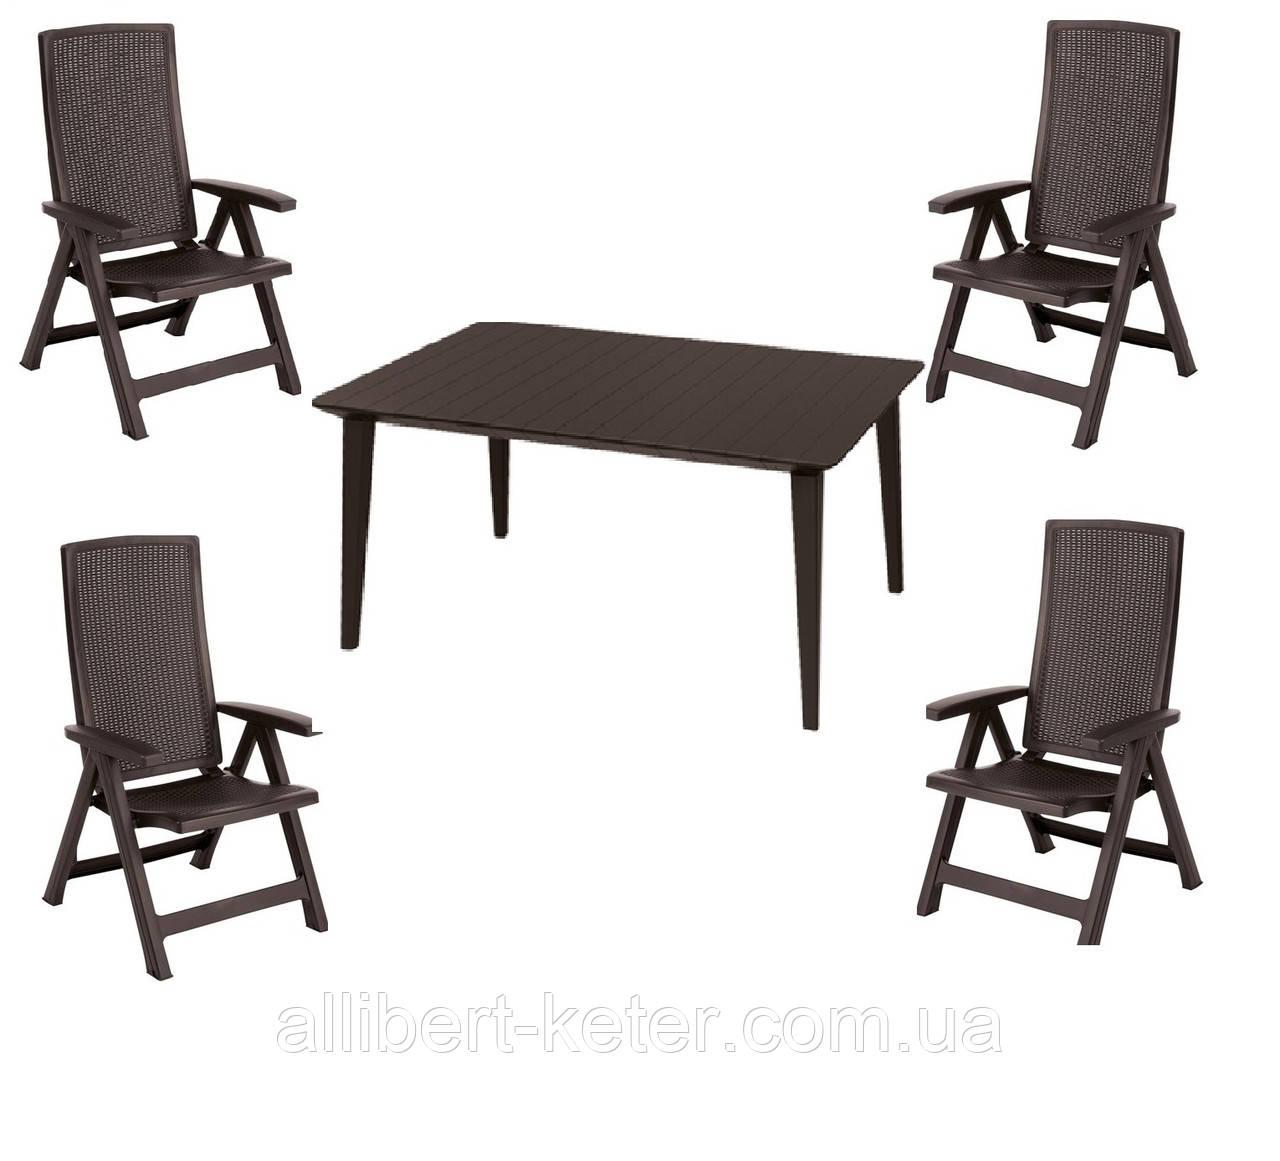 Комплект садових меблів MONTREAL WITH LIMA DINING SET темно-коричневий (Keter)